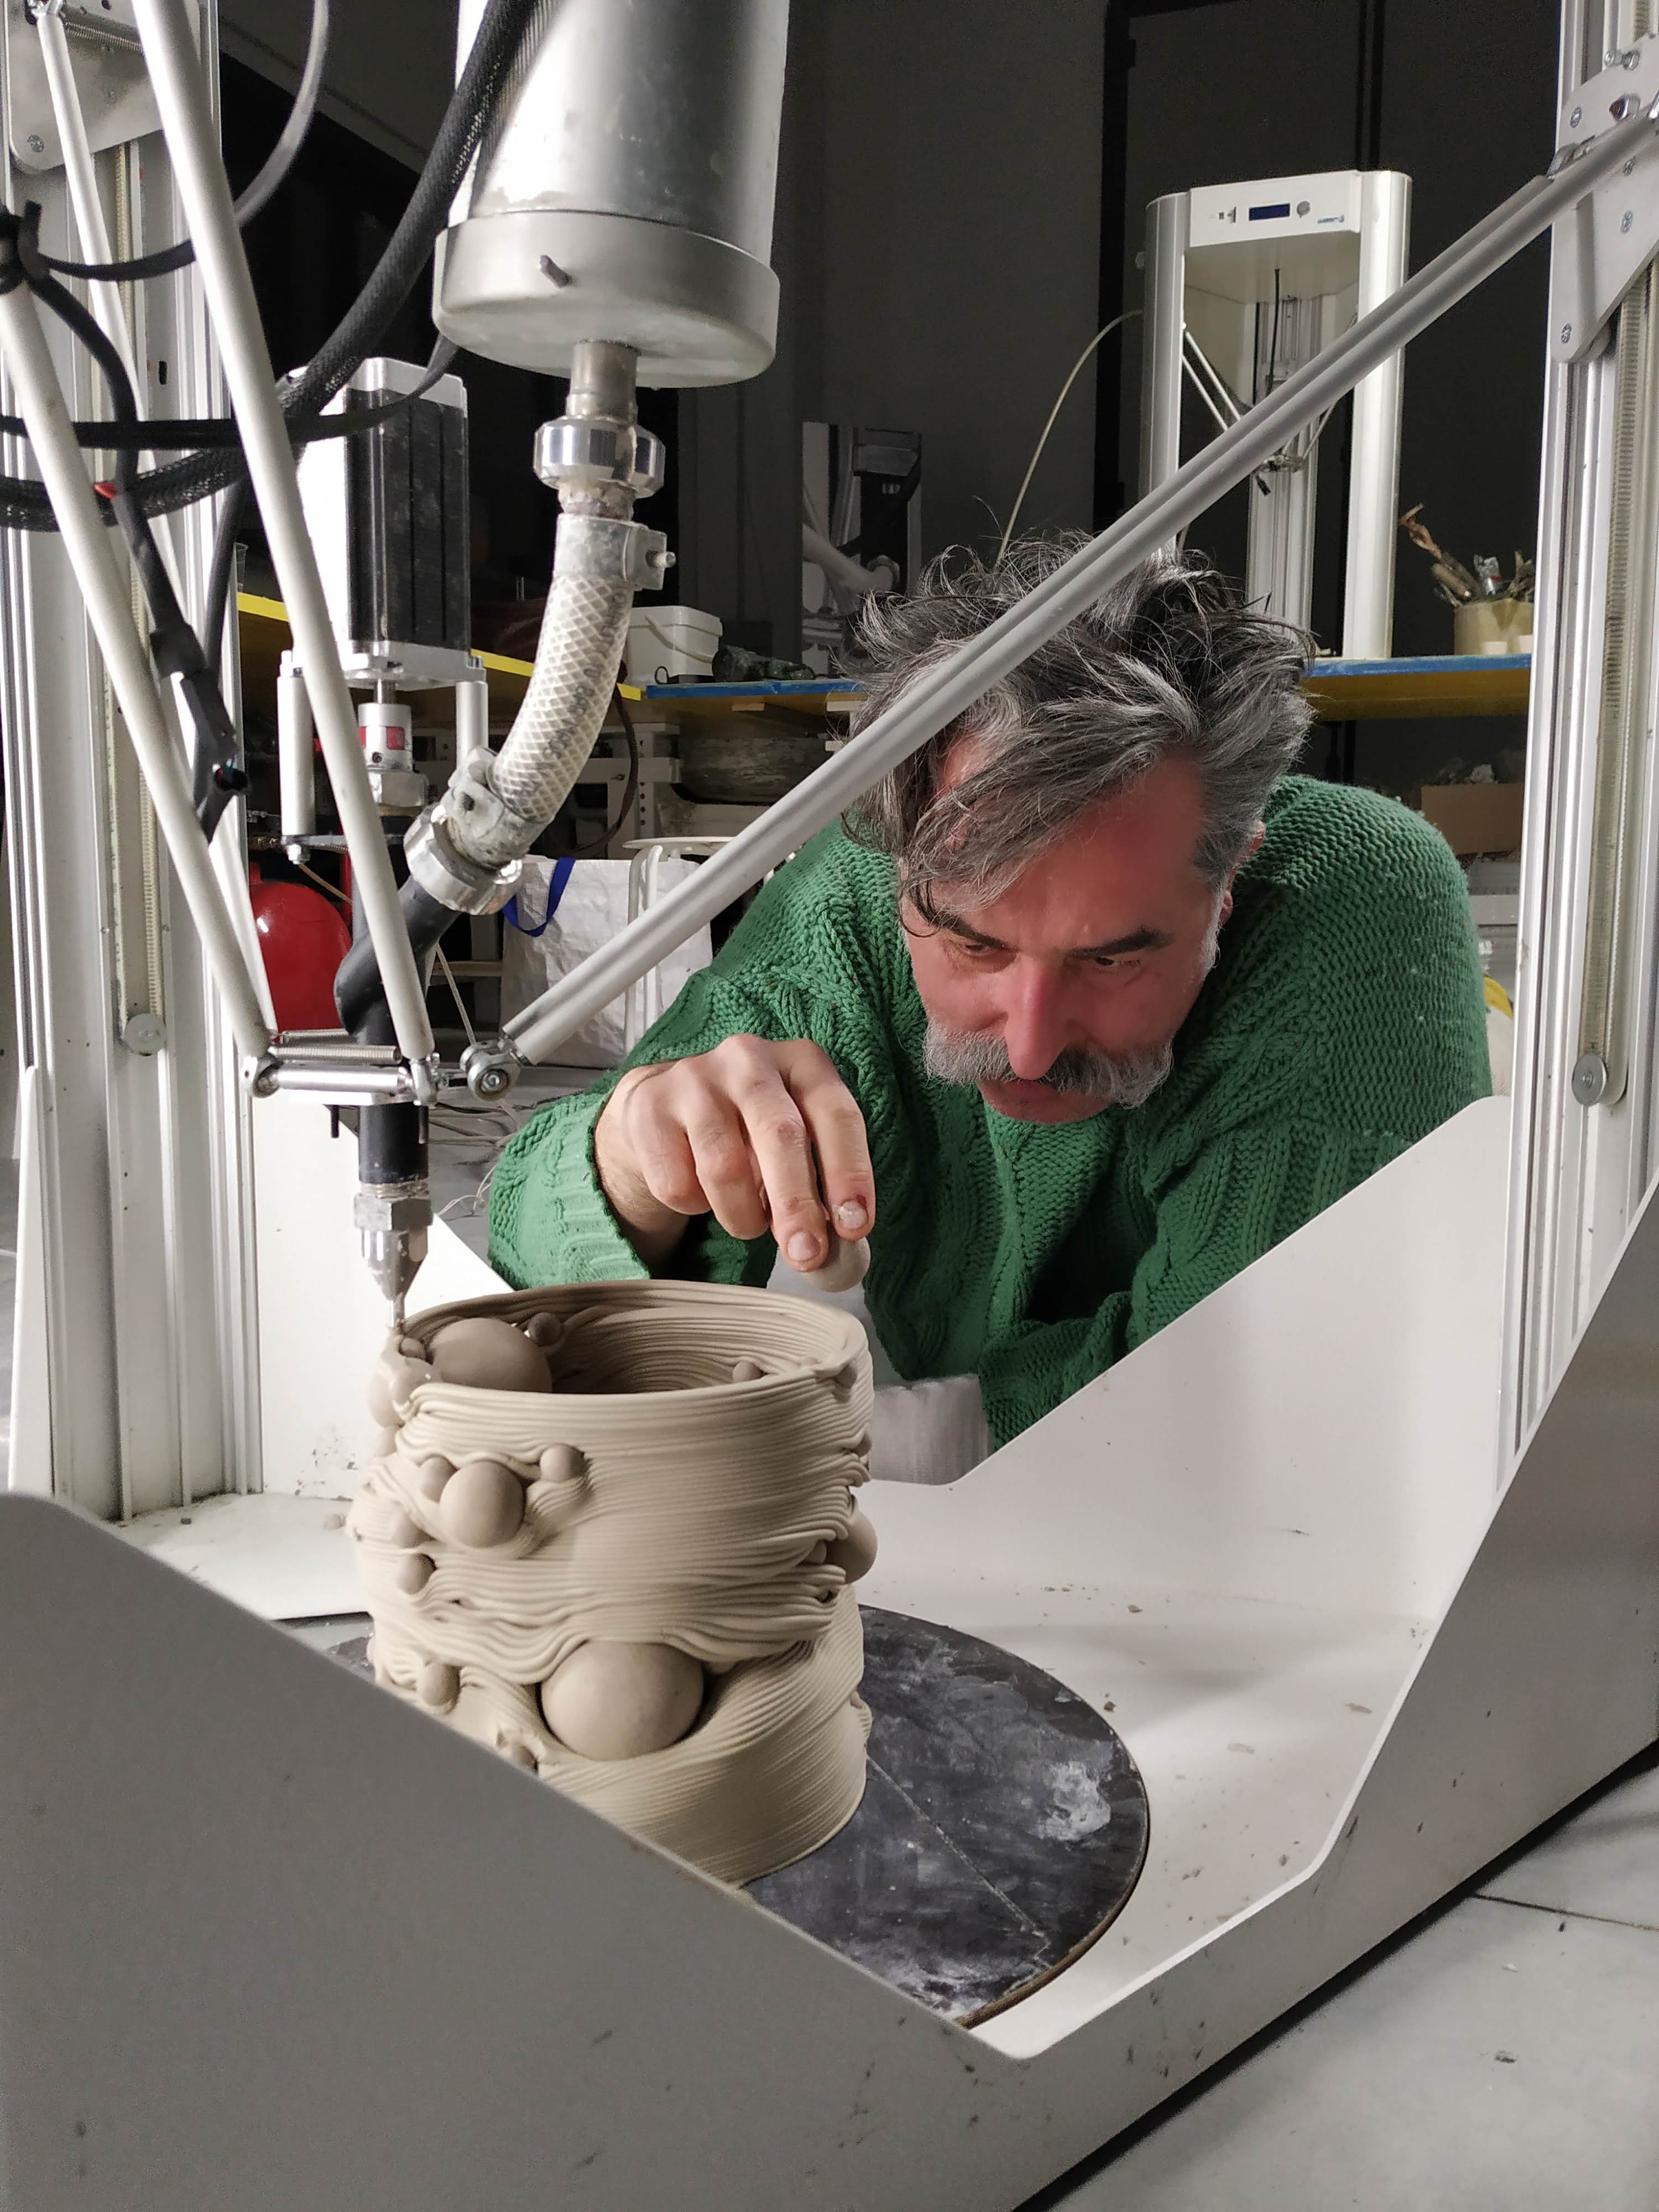 Salvatori inserts ceramic balls into the 3D printed vases. Photo via WASP.